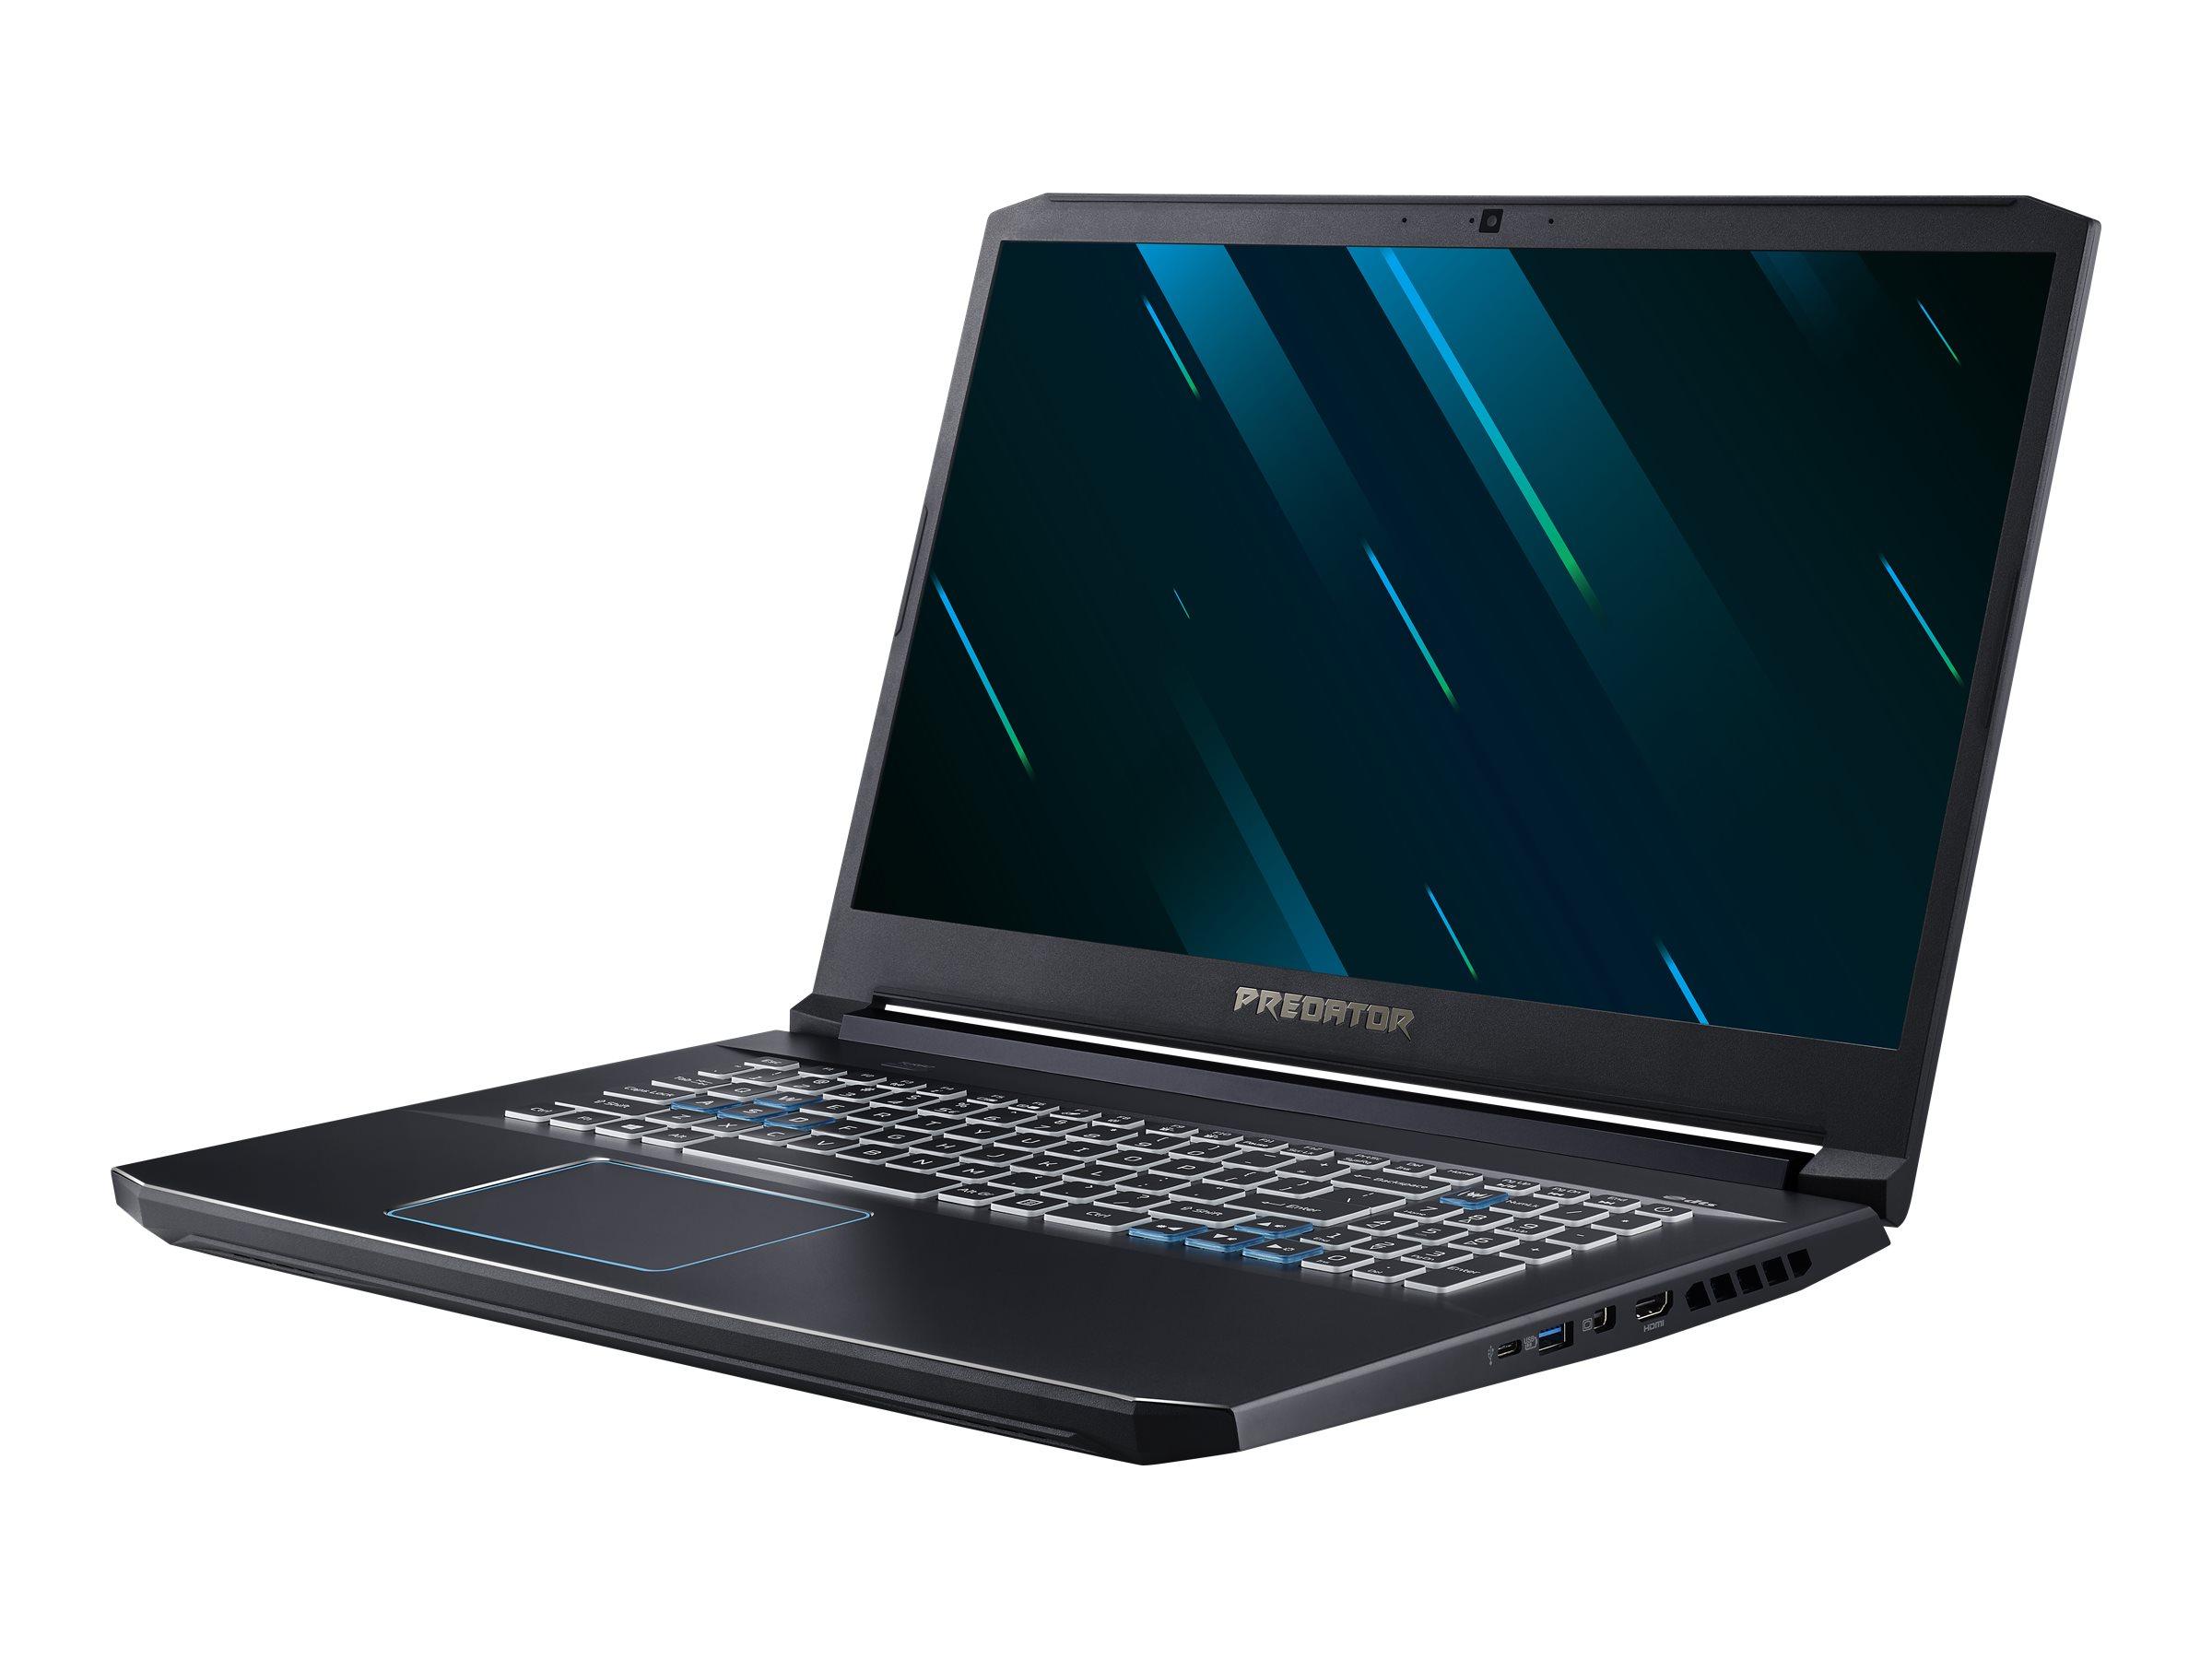 Acer Predator Helios 300 PH317-54-7446 - Core i7 10750H / 2.6 GHz - Win 10 Home 64-Bit - 16 GB RAM - 1.024 TB SSD SED -